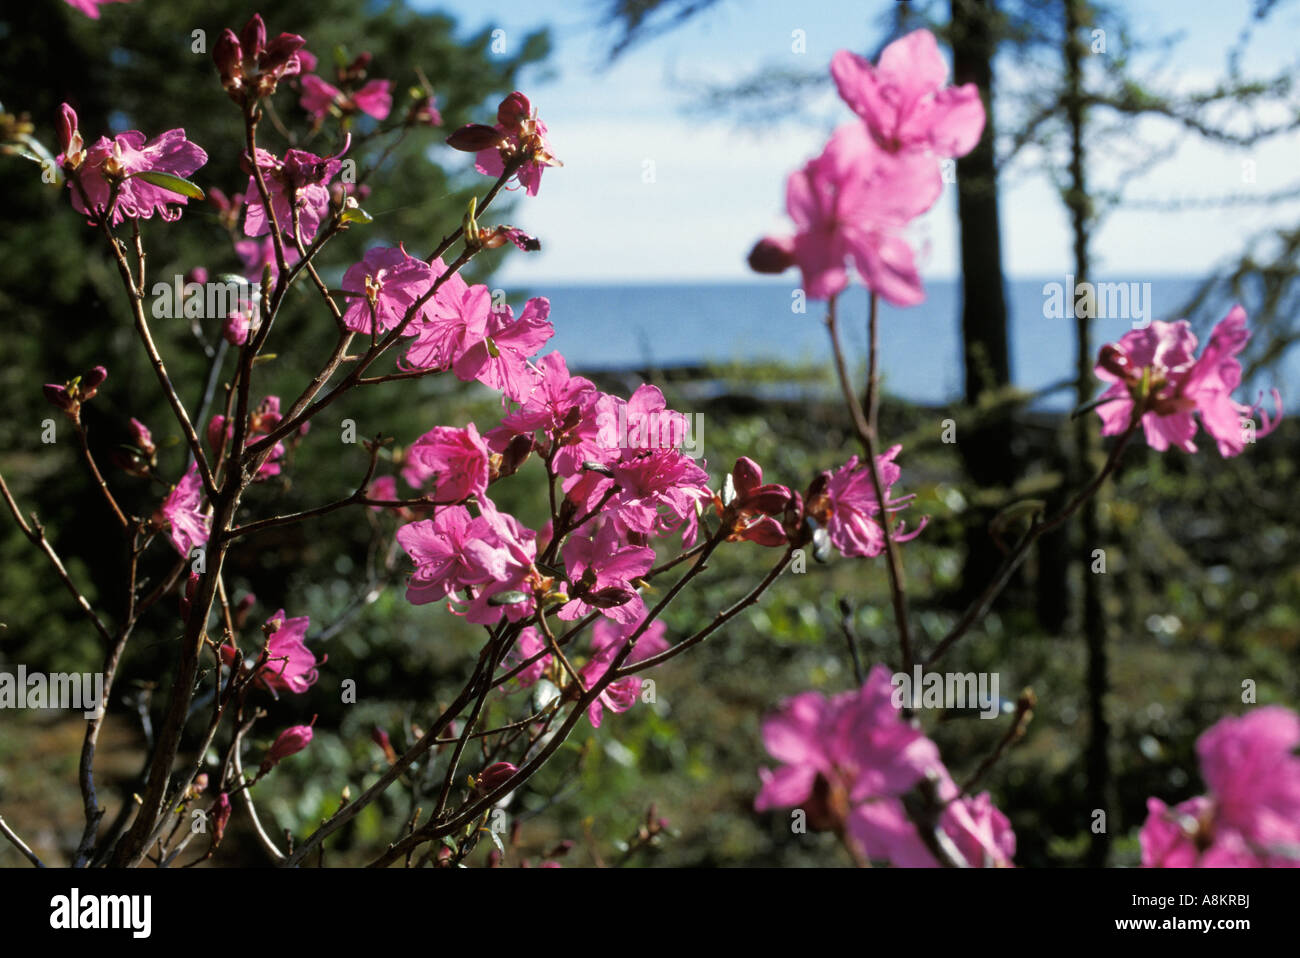 Rhododendron dauricum, Zabaikalsky Nationalpark, Ushkany Islands, Lake Baikal, Siberia, Russia - Stock Image